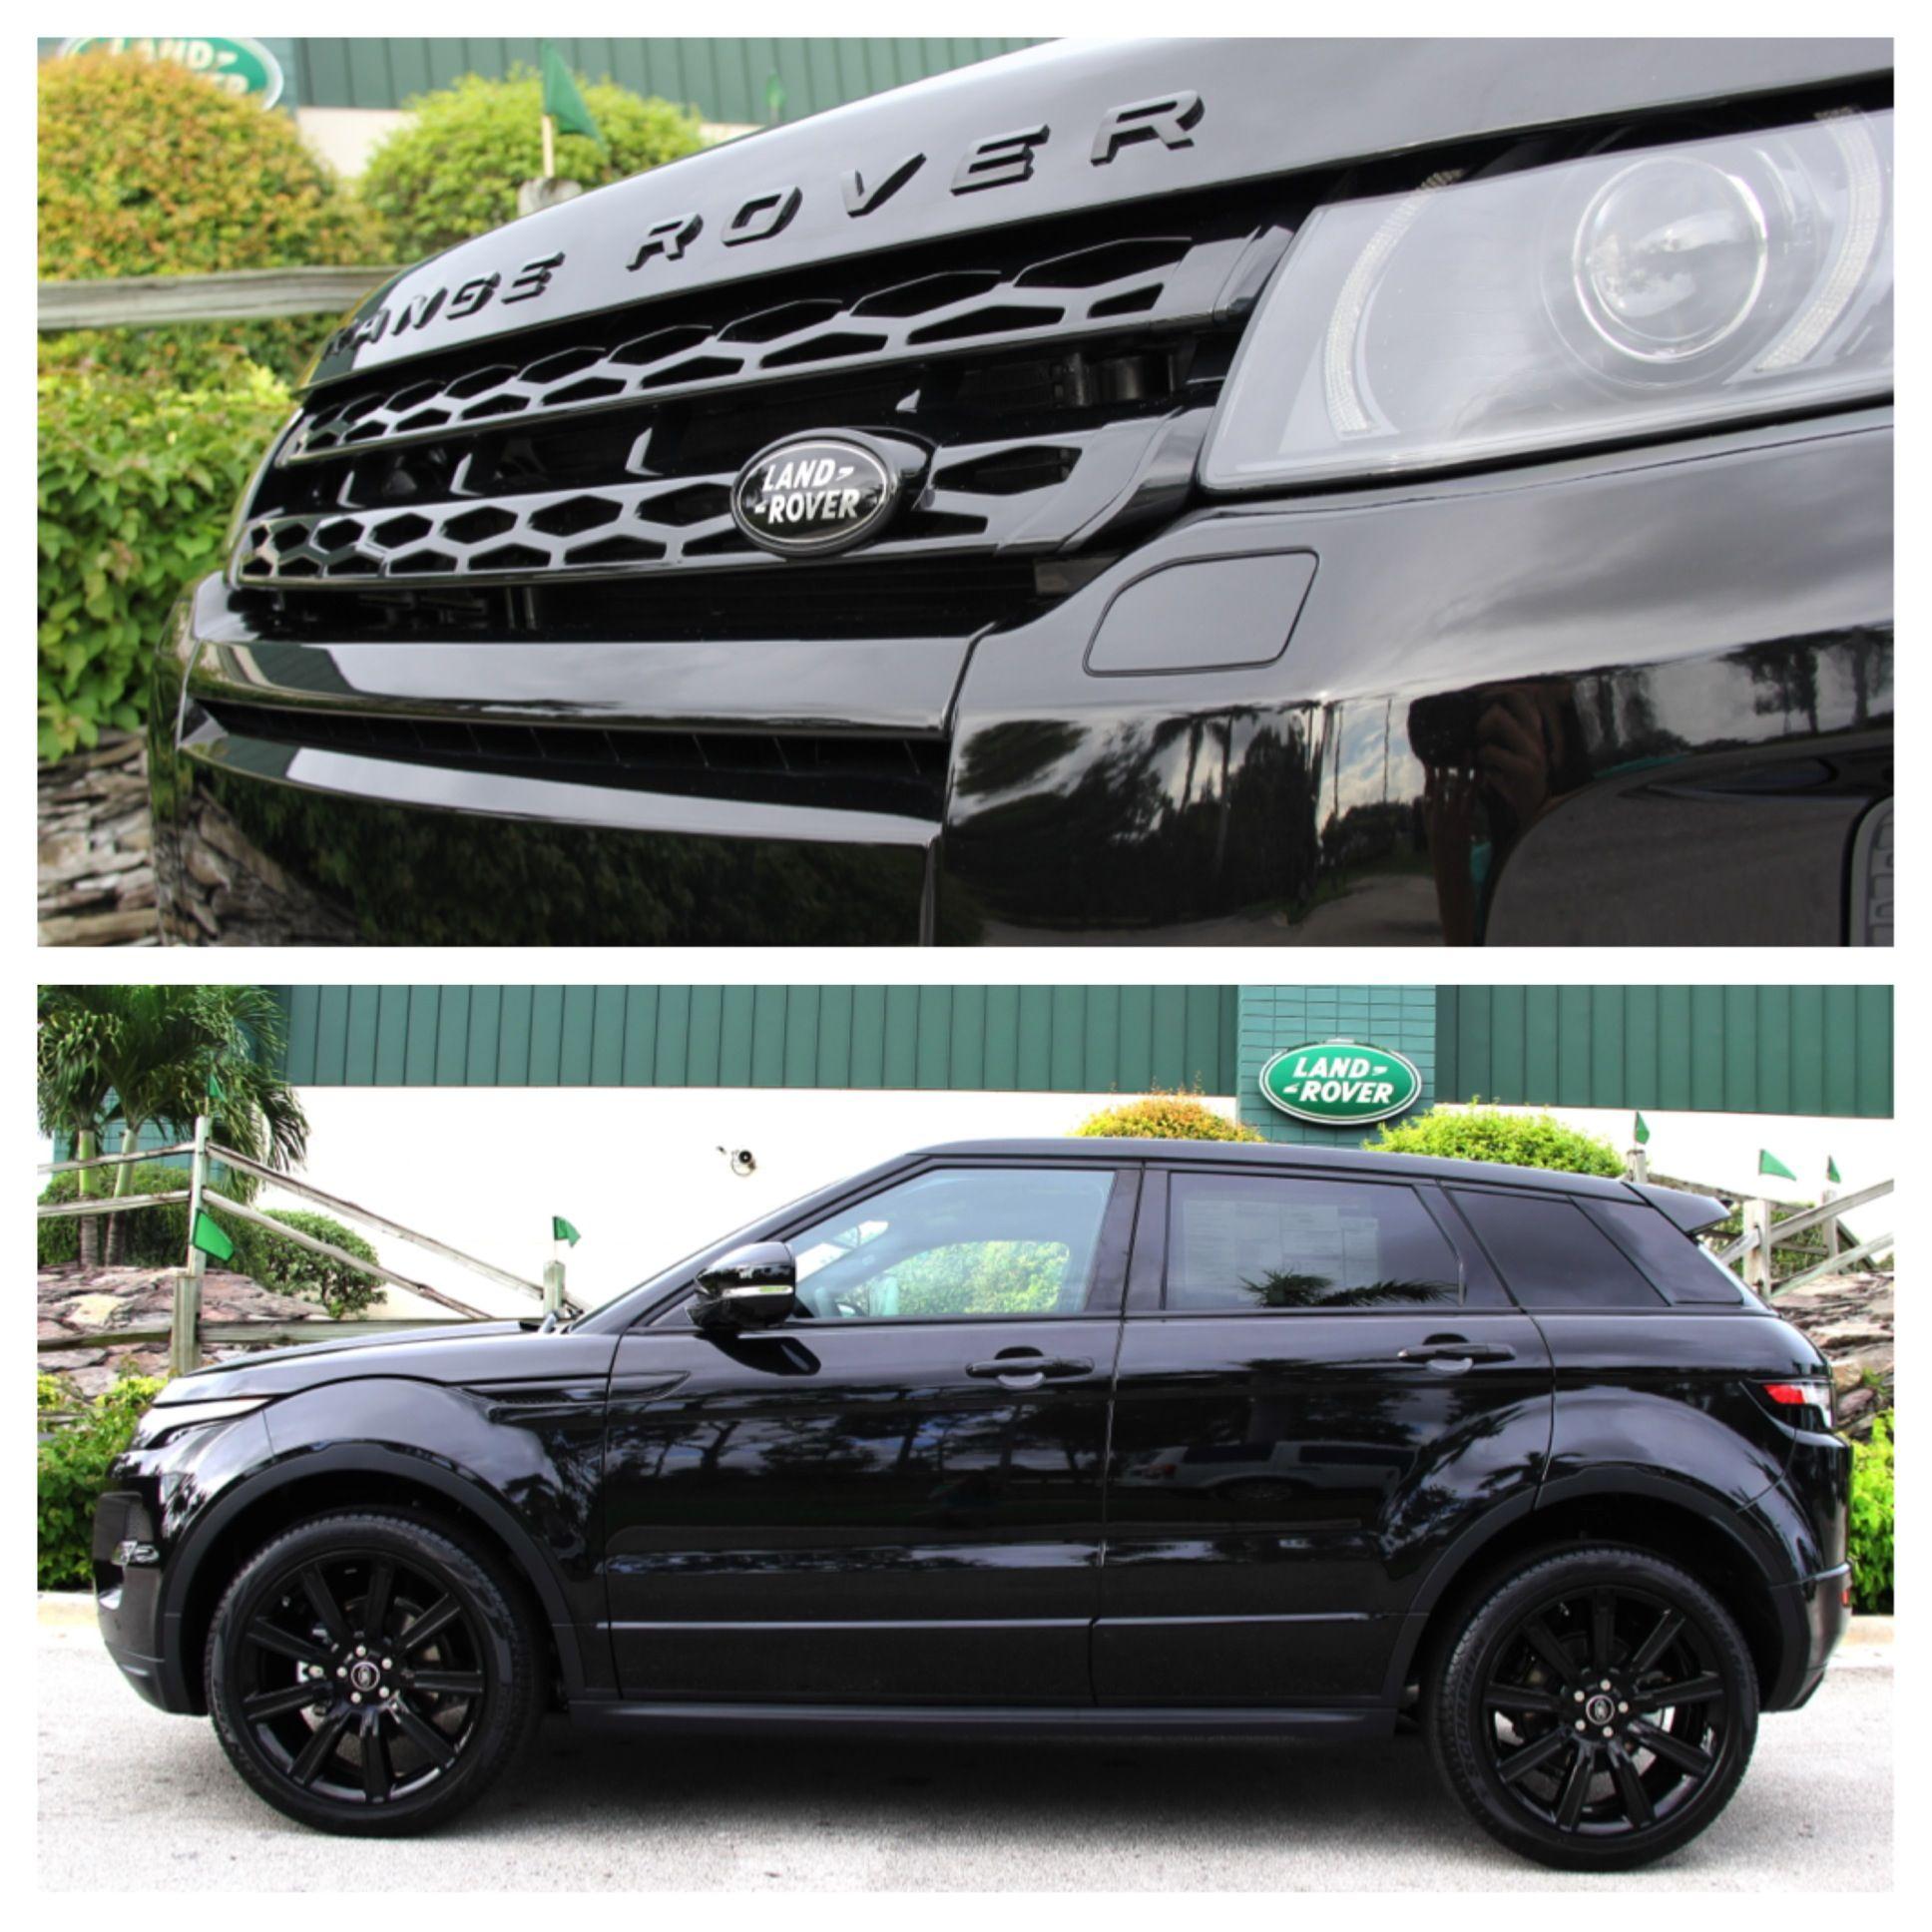 Land Rover Range Rover Evoque Dynamic Black Limited